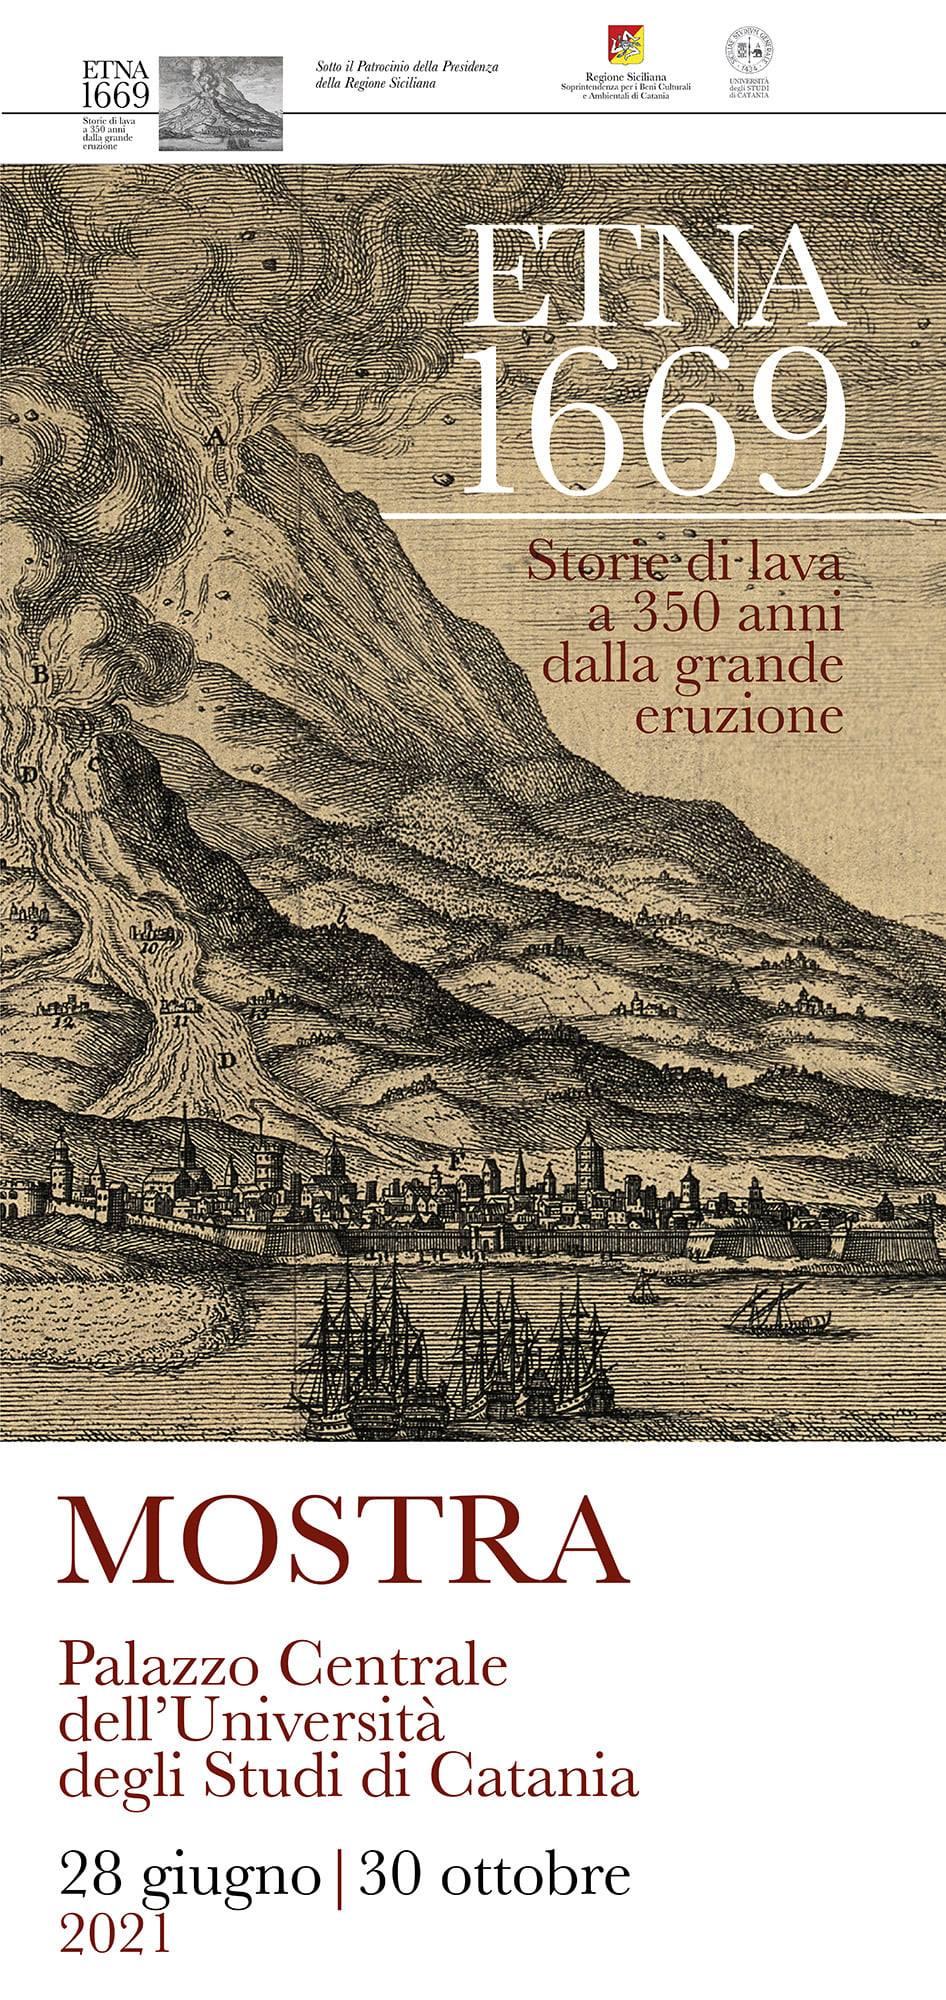 Catania. Mostra: Etna 1669. Storie di lava a 350 anni dalla grande eruzione  - etnalife